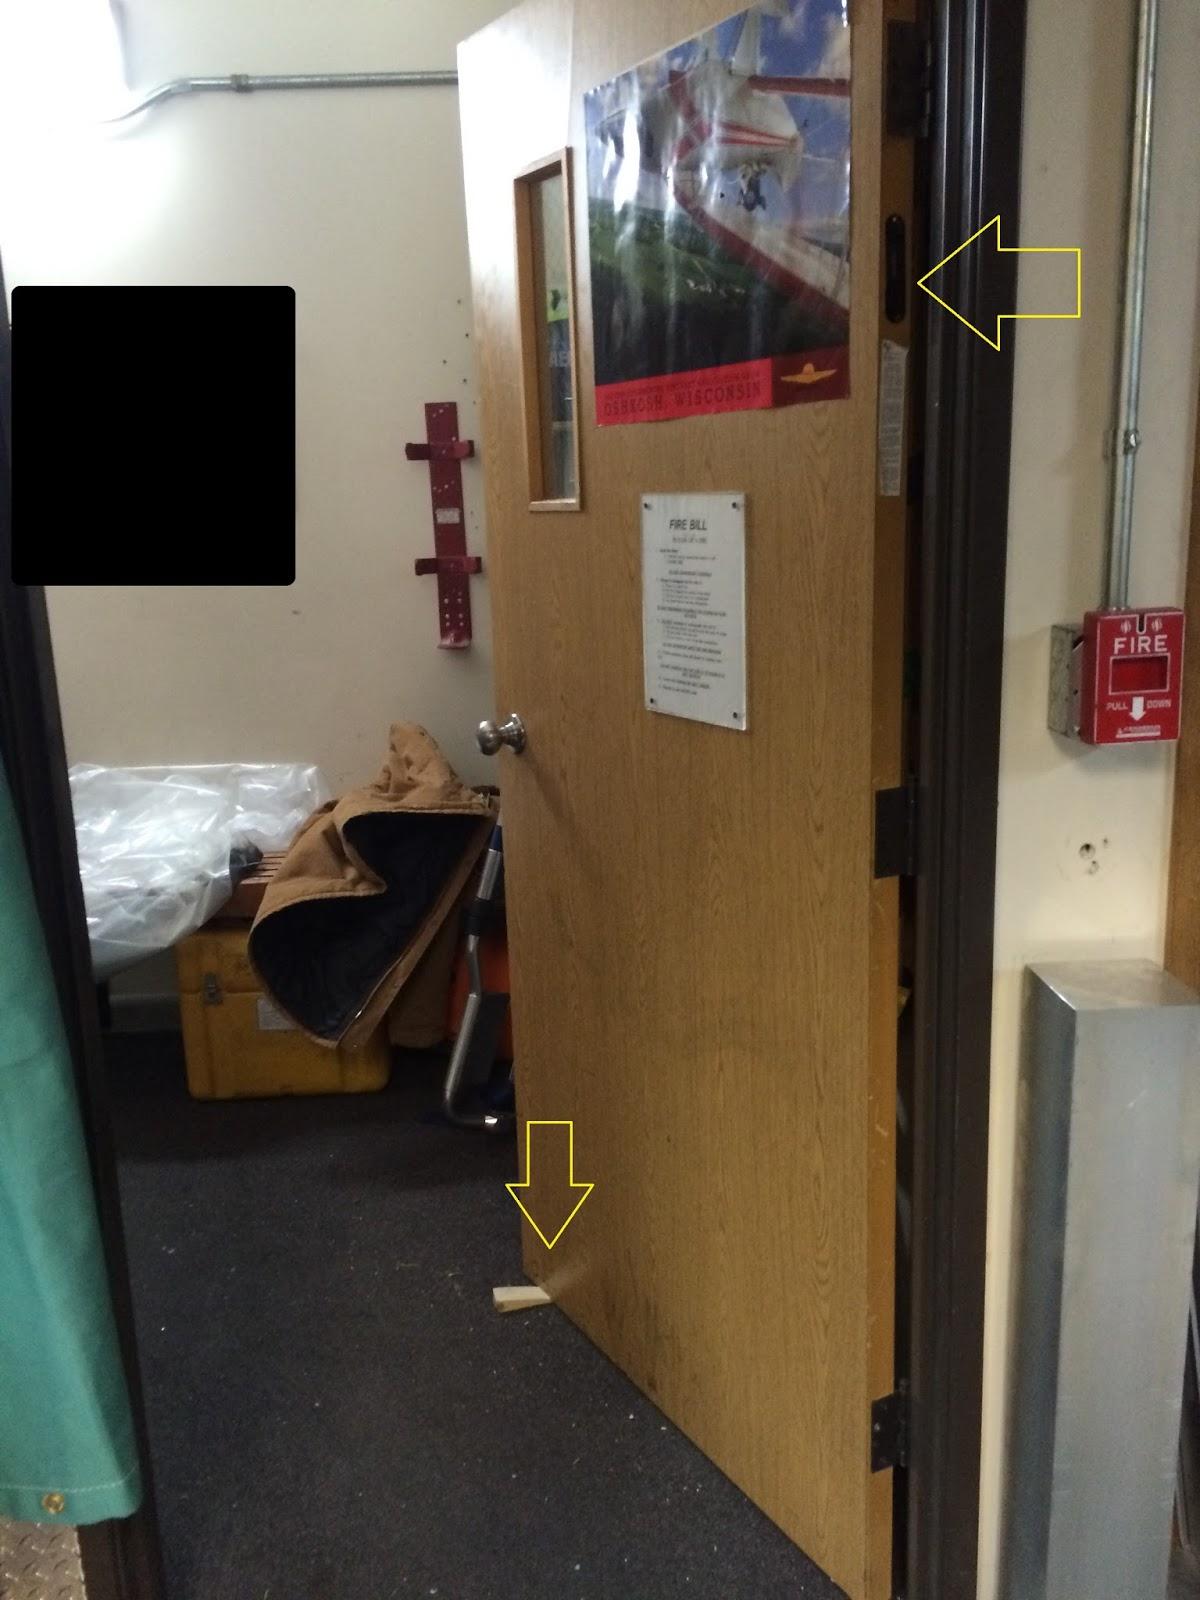 Below a photo shows a propped open fire door & Fire Protection Deficiencies: Doors